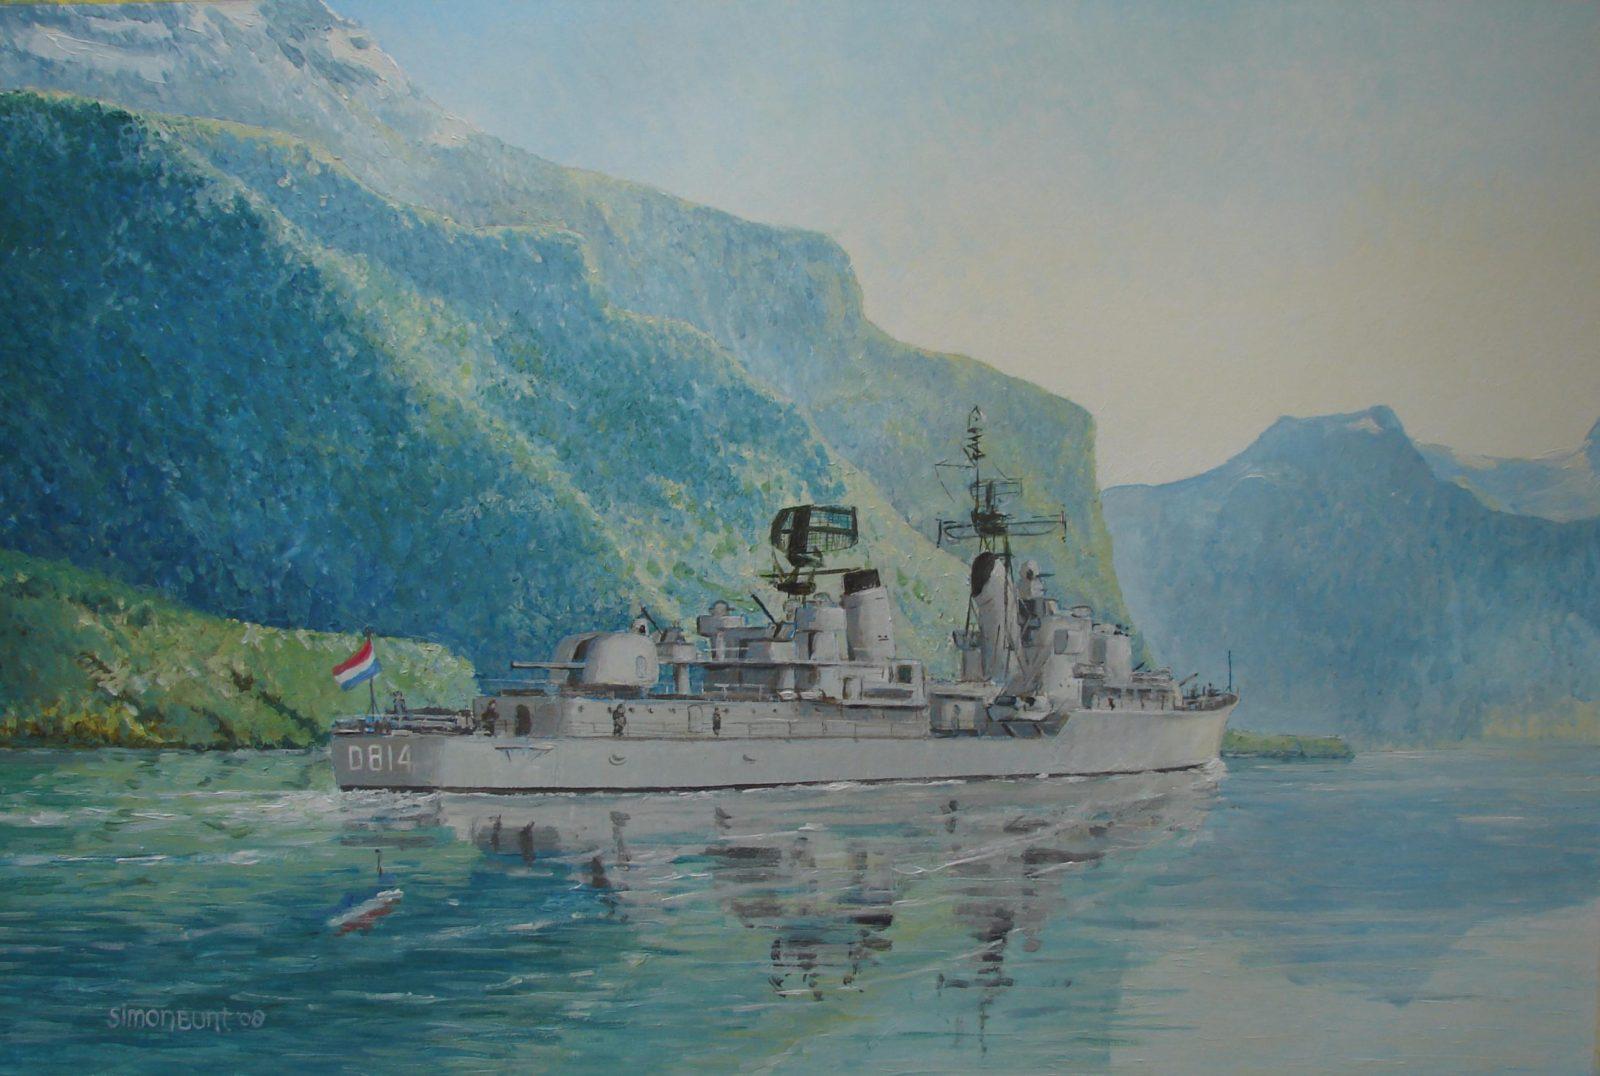 HMNLMS Limburg in Hardangerfjord,acrylic on paper, 65x42